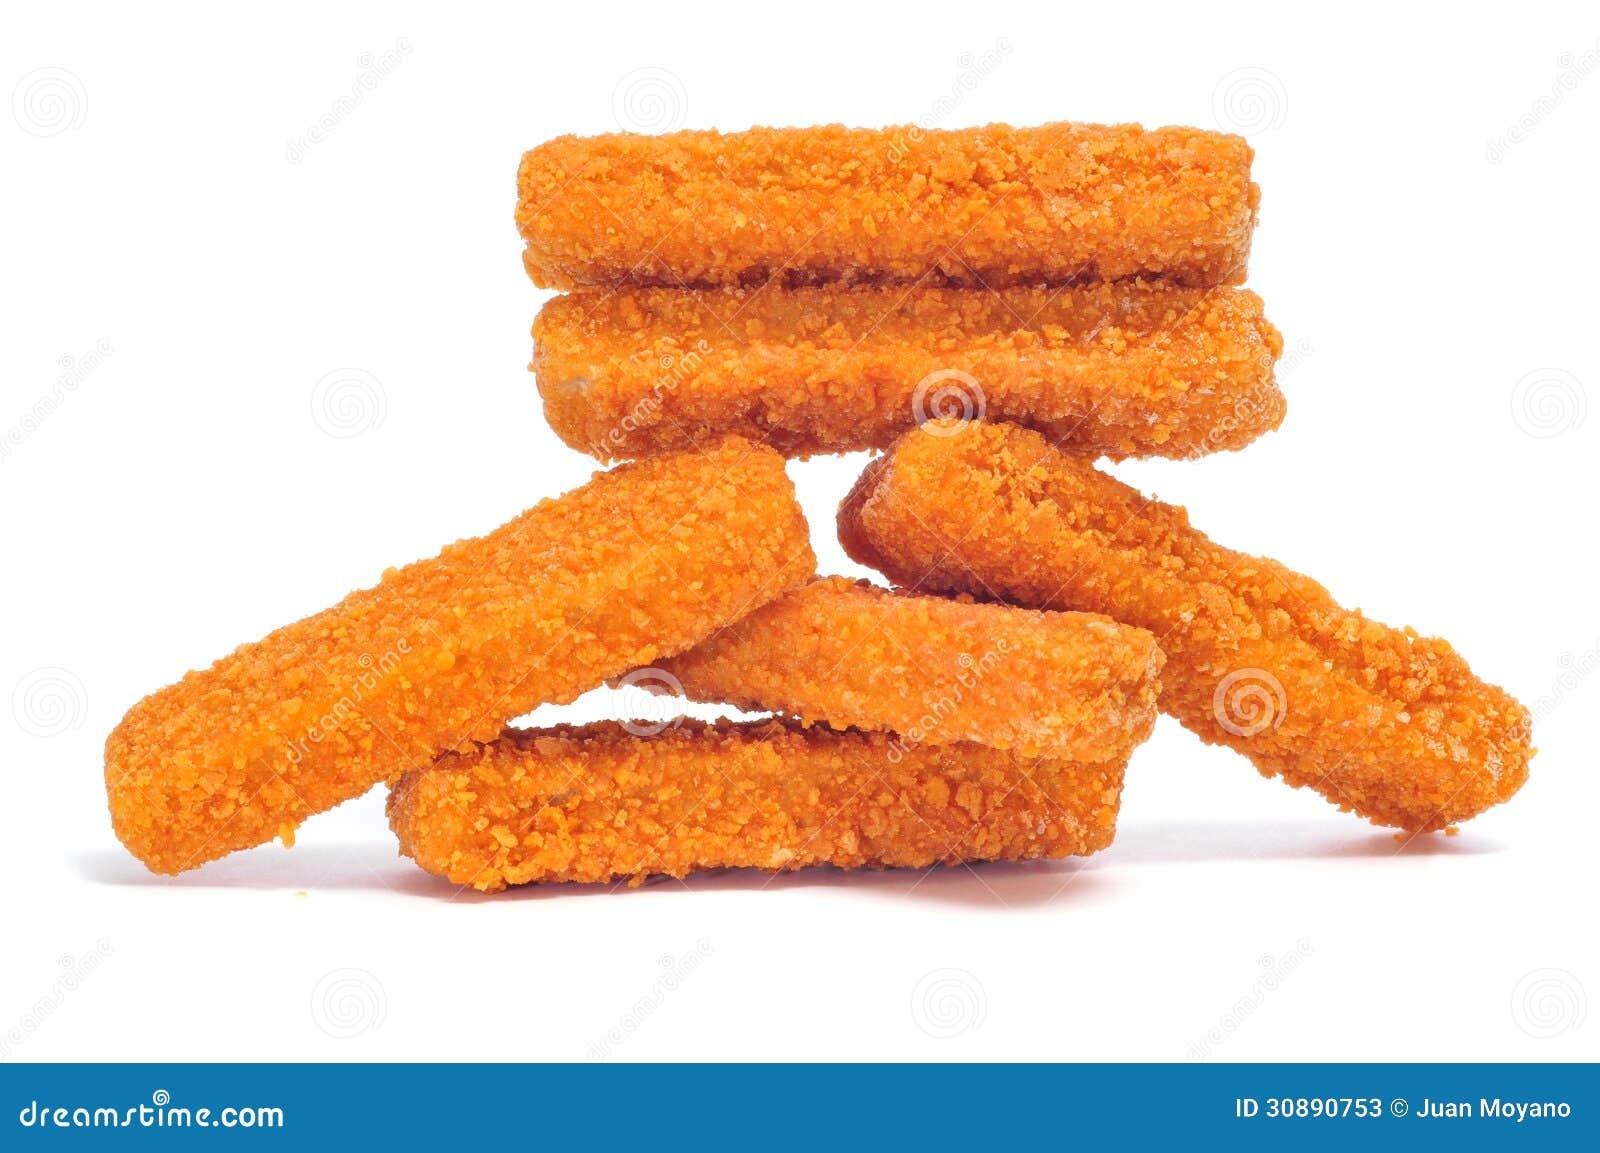 Fish Sticks Stock Photos - Image: 30890753